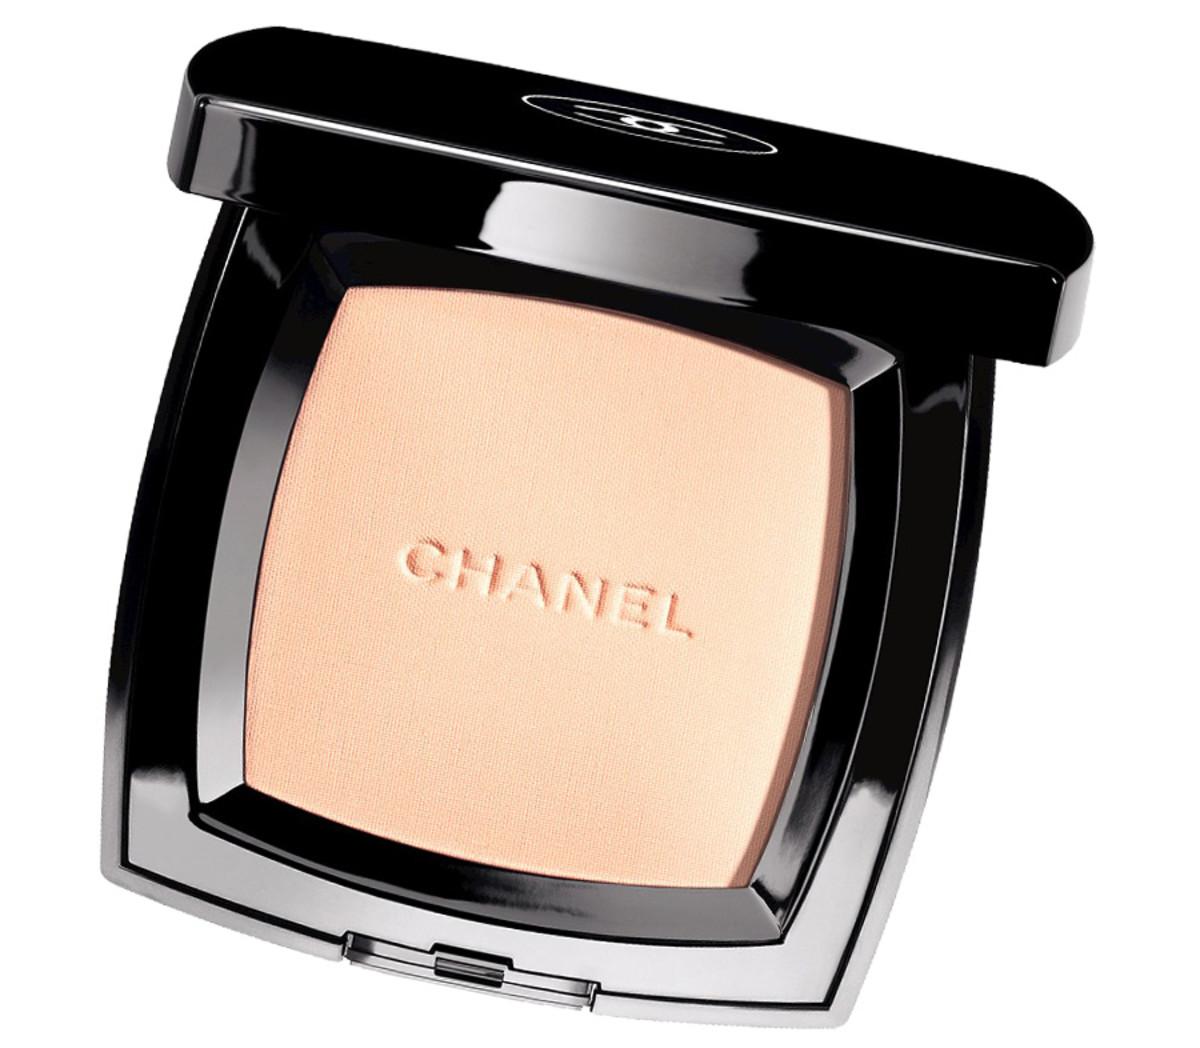 Chanel Spring 2014_Chanel Poudre Universelle Preface Translucent Powder_Light Peach_image edit by BEAUTYGEEKS imabeautygeek.com.jpg